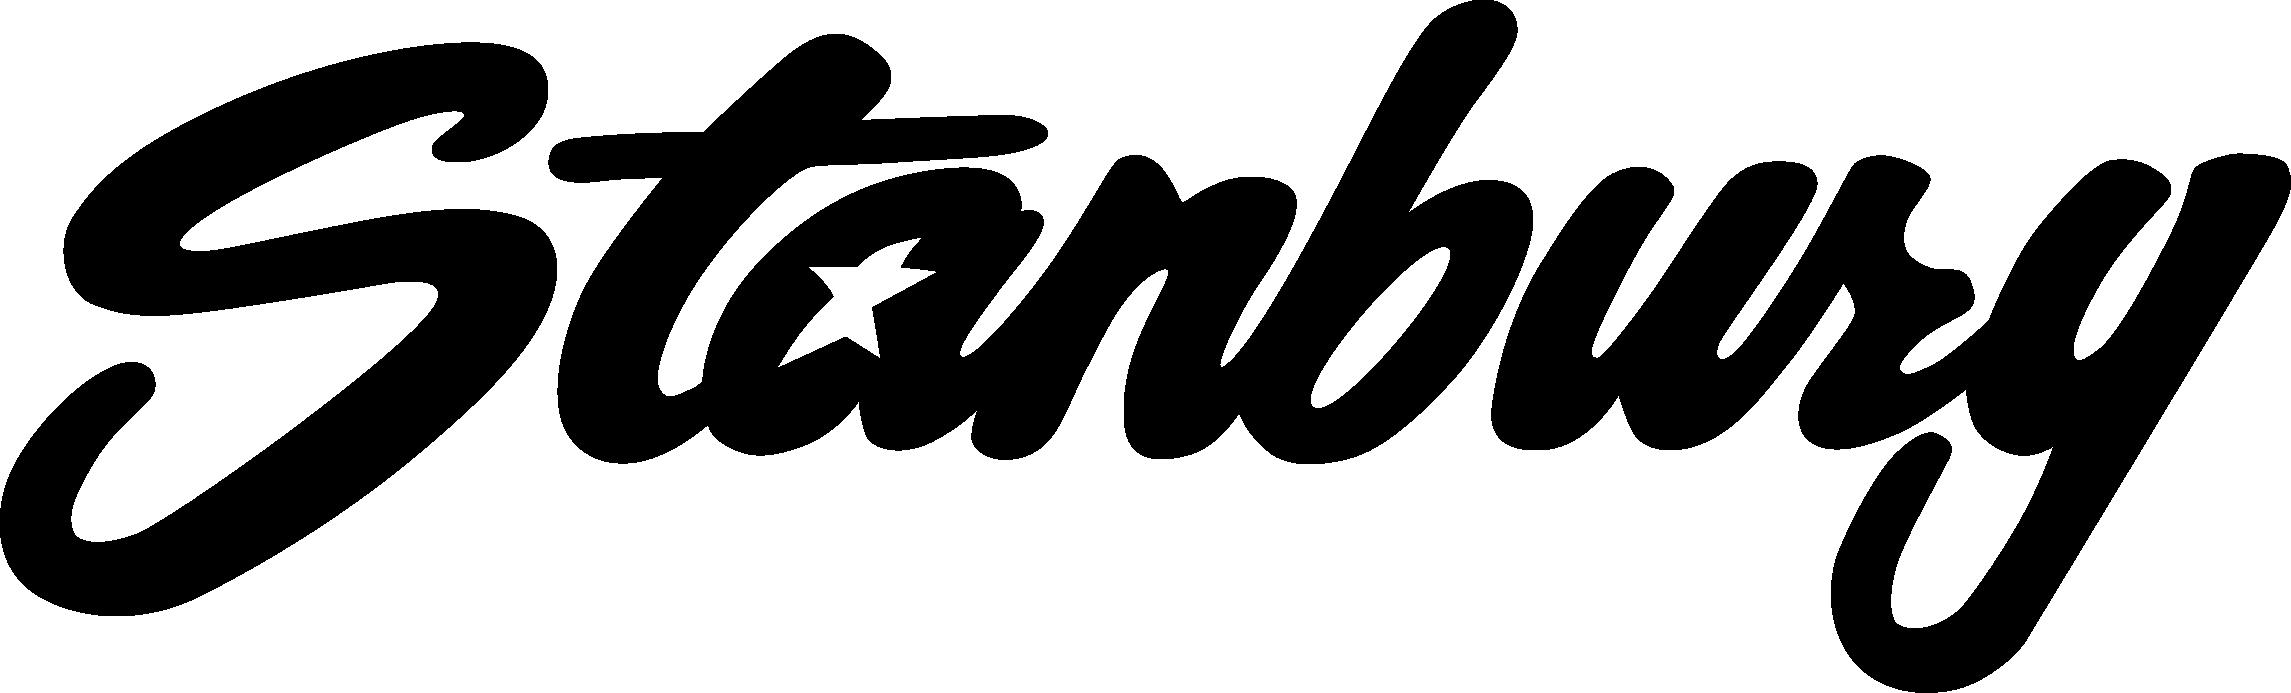 stanbury logo